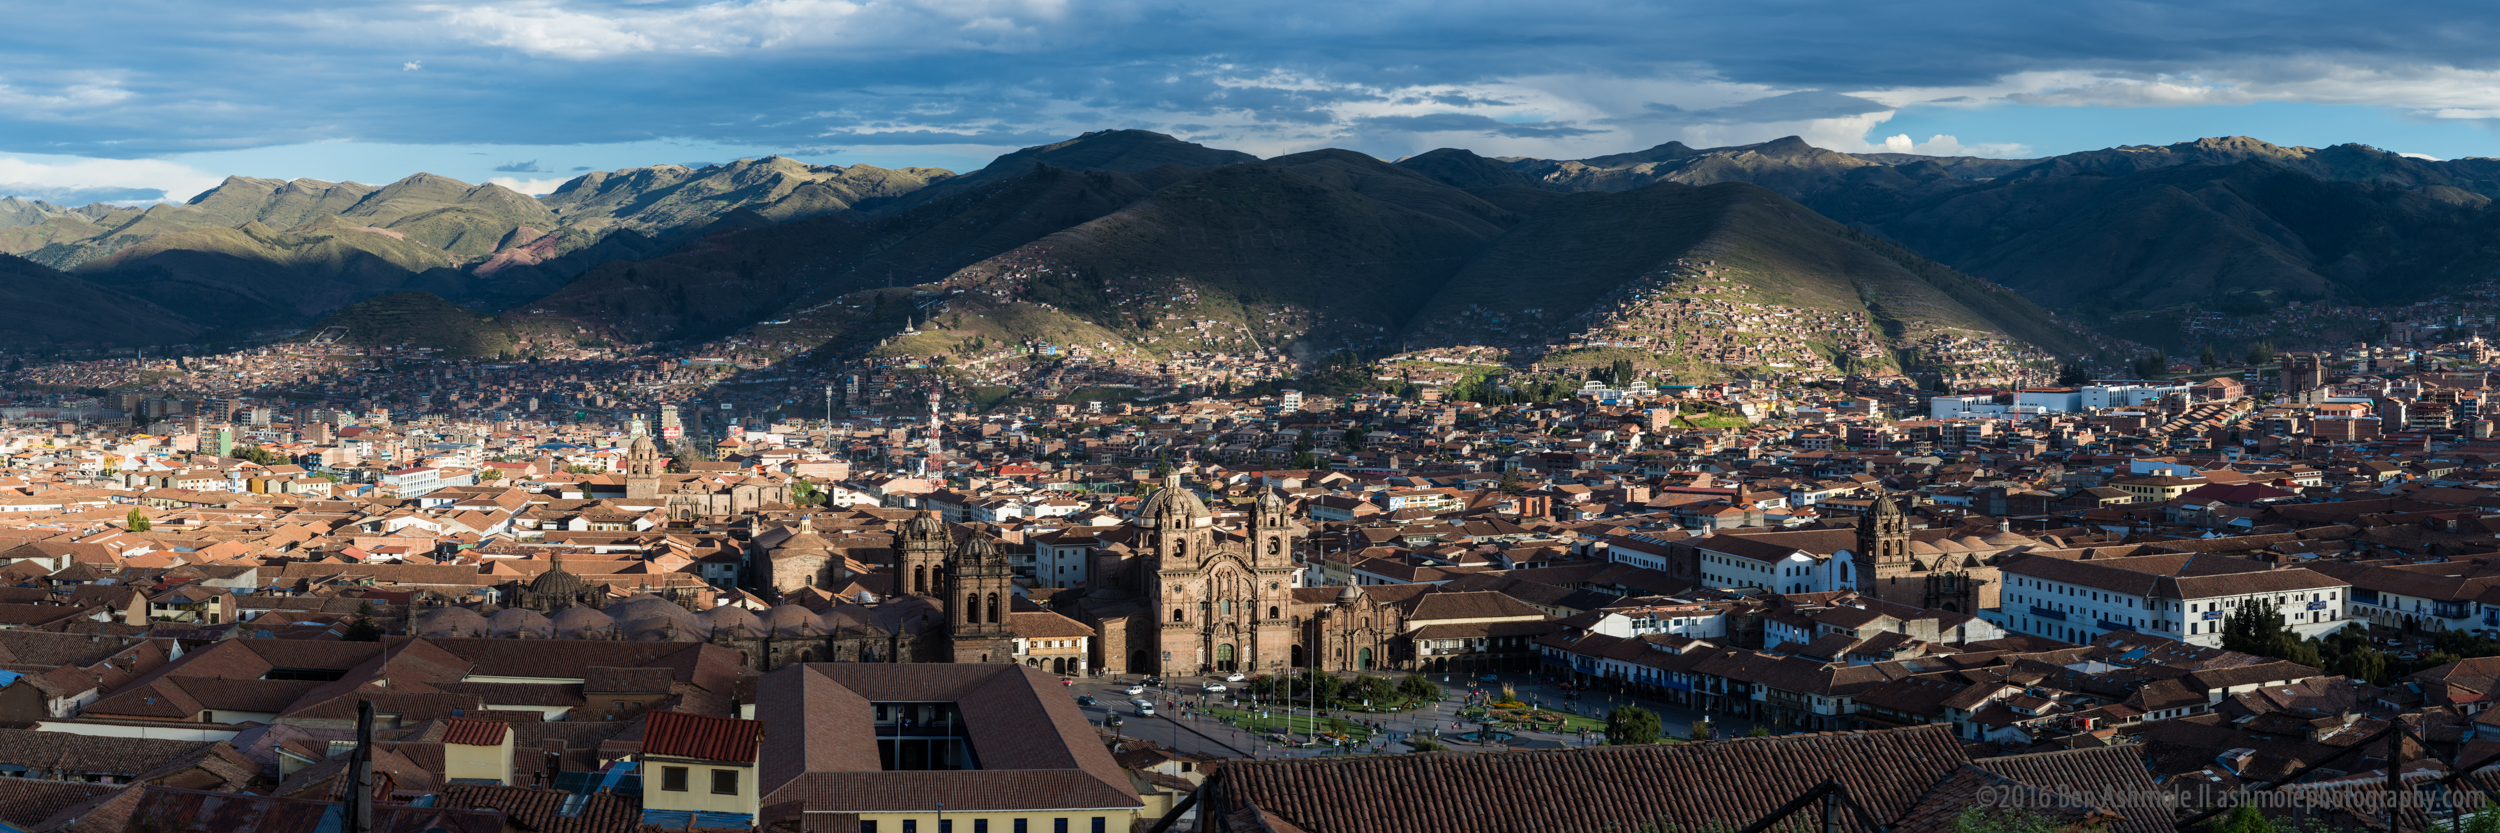 Cusco City Panorama, Peru, Ben Ashmole.jpg